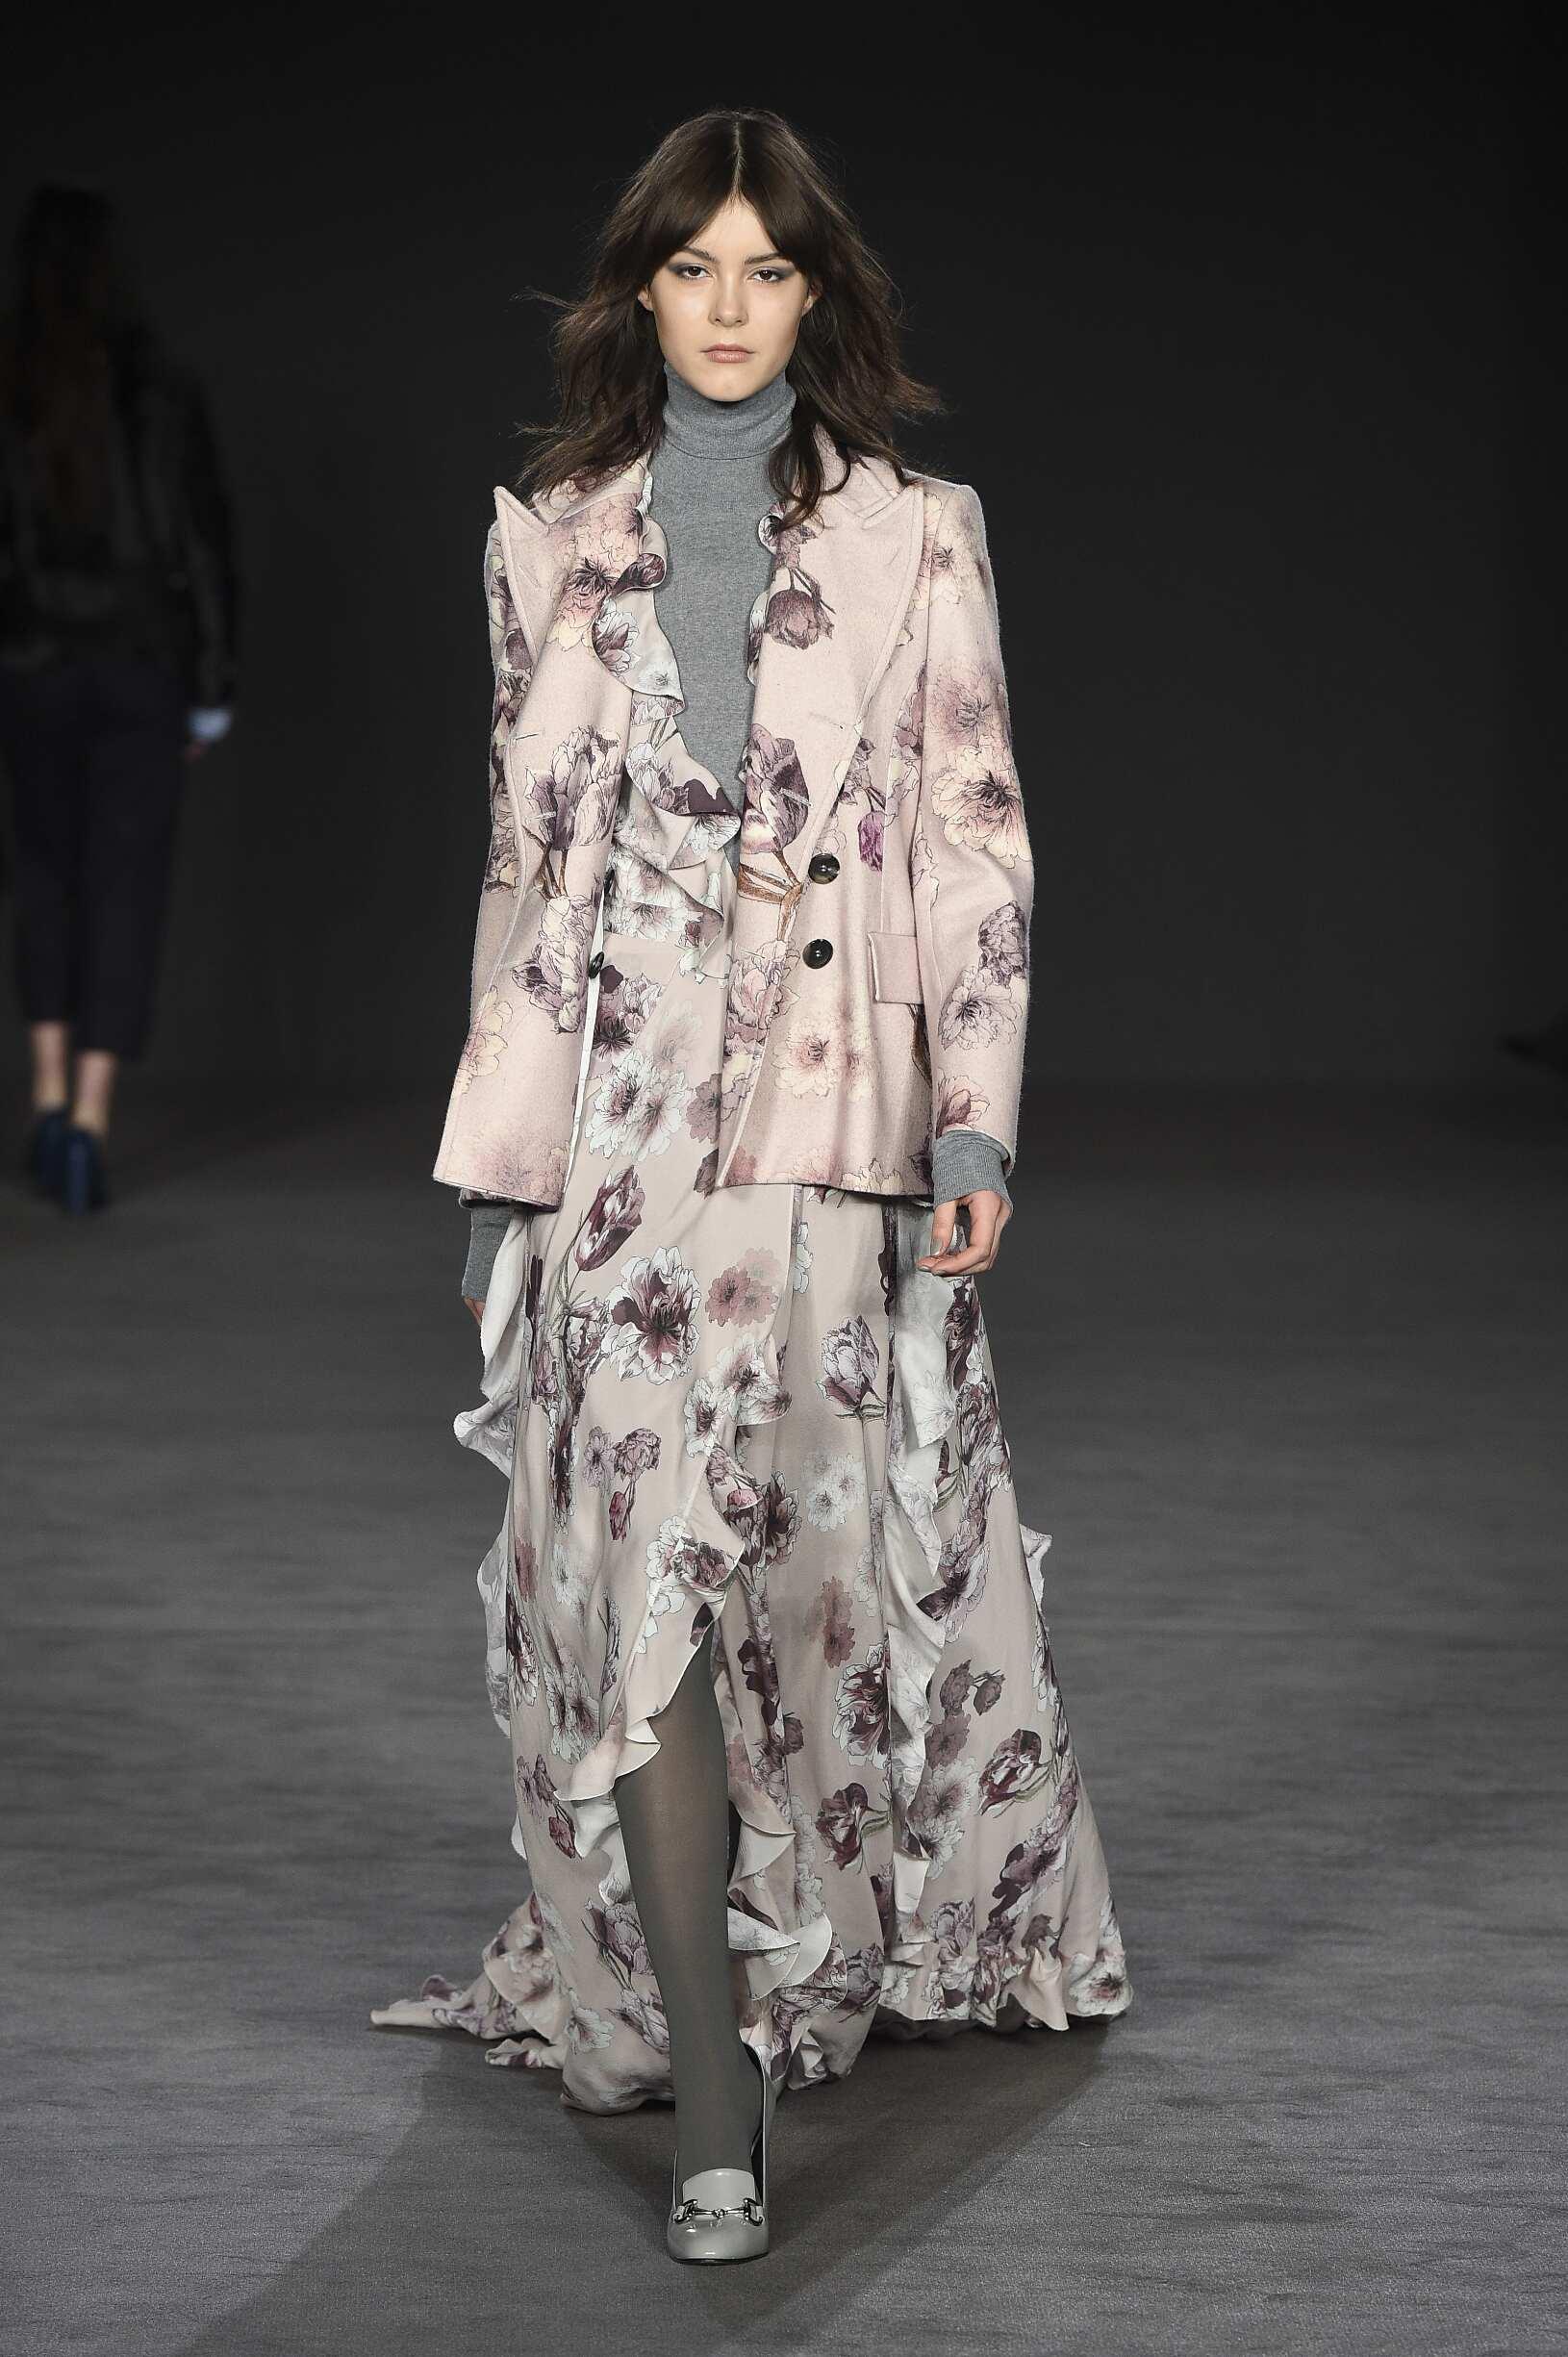 Woman FW 2017-18 Fashion Show Daks